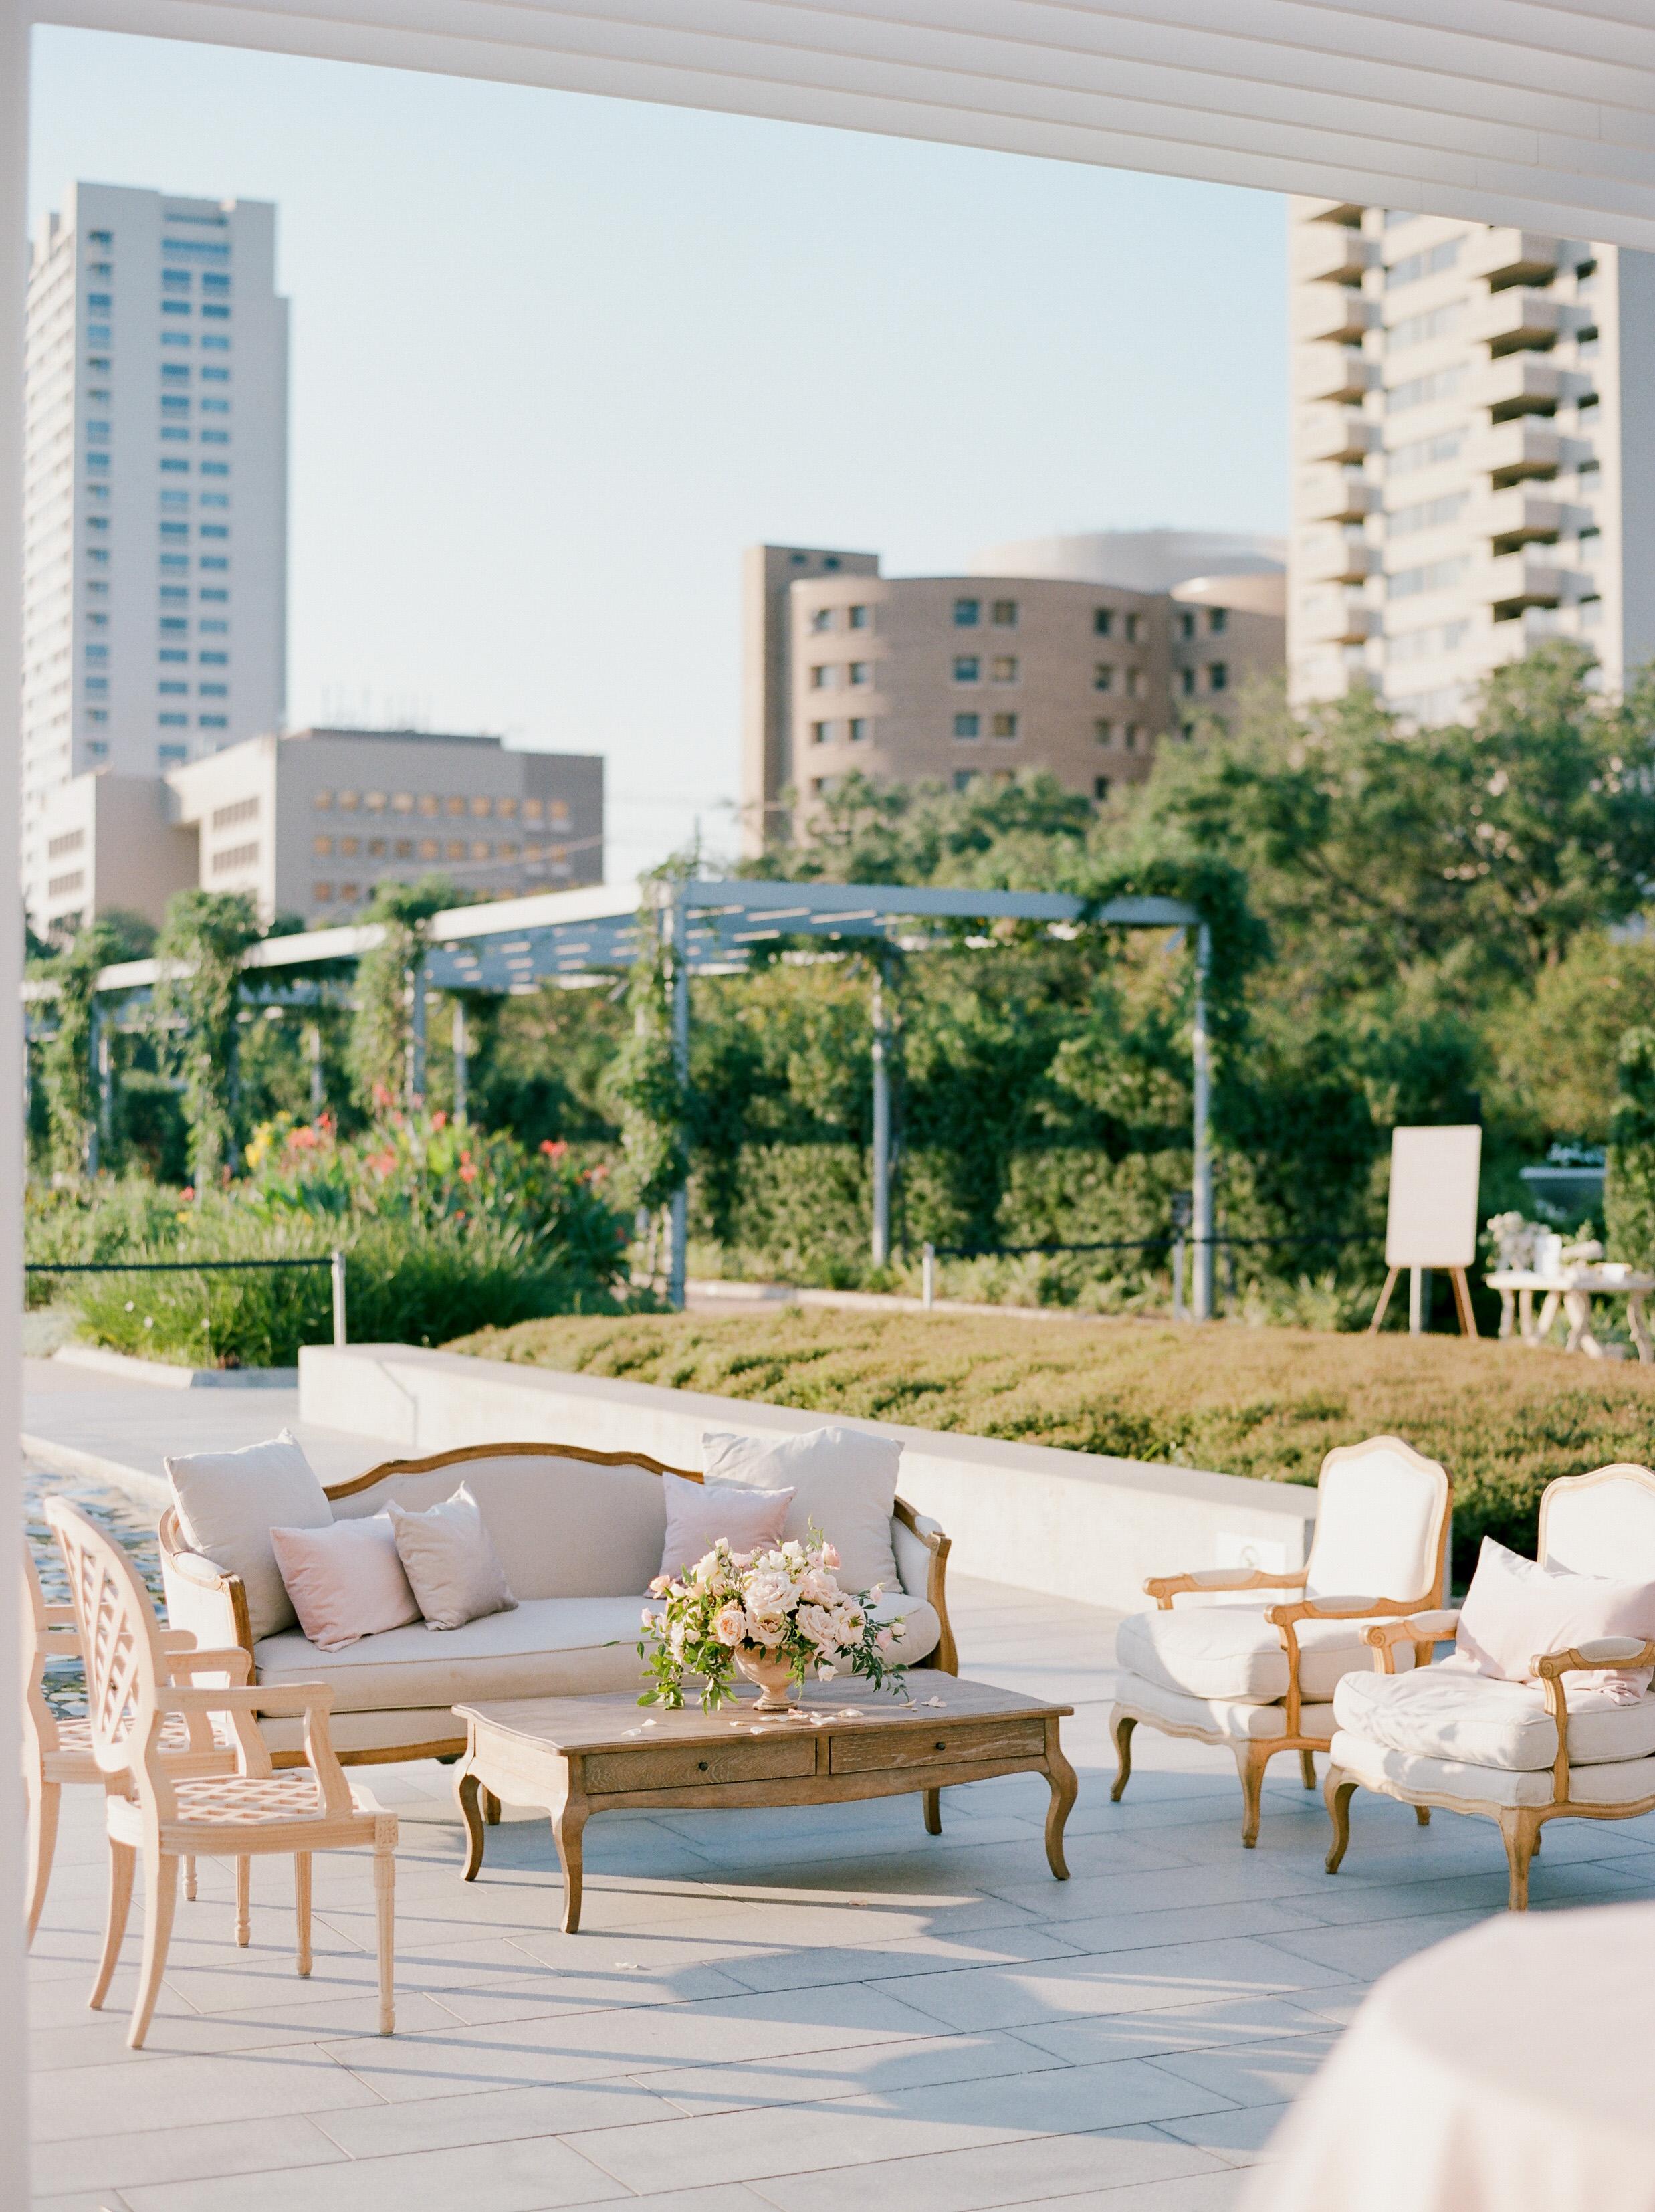 Martha-Stewart-Wedding-Dana-Fernandez-Photography-Josh-Texas-Film-Houston-Wedding-Fine-Art-Photographer-McGovern-Centennial-Gardens-Top-Best-25.jpg